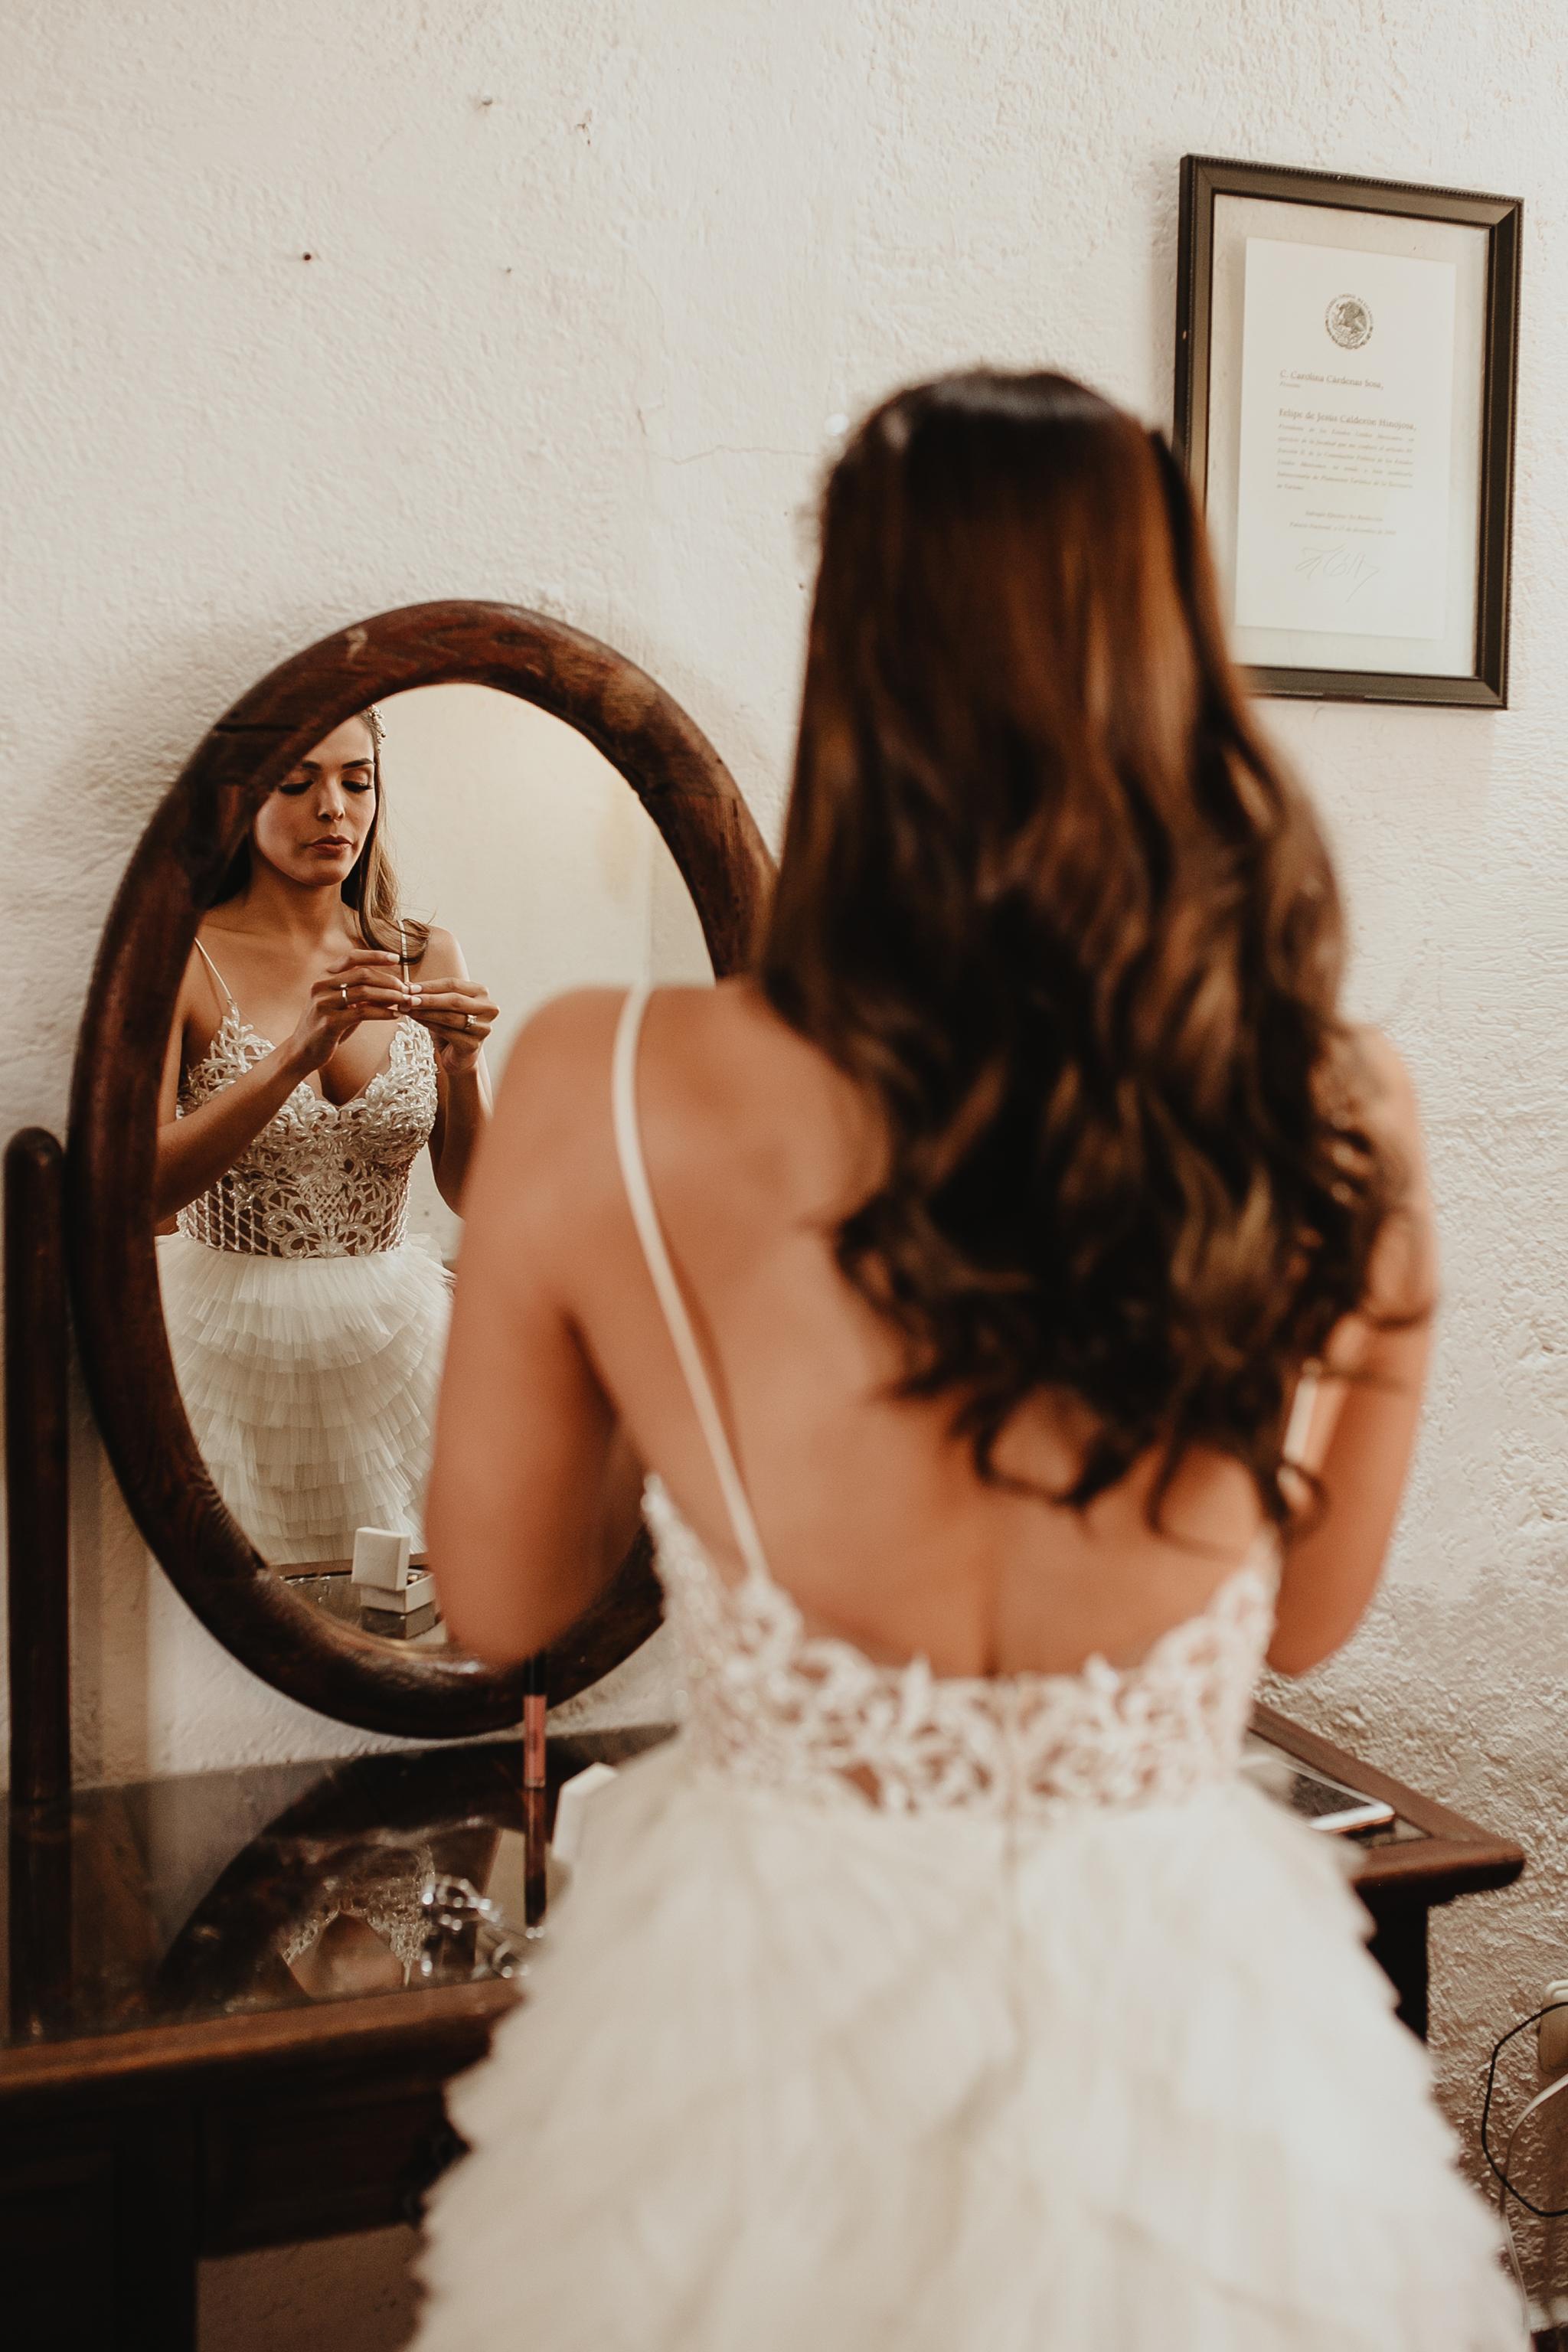 0086R&F__WeddingDestination_Weddingmerida_BodaMexico_FotografoDeBodas_FabrizioSimoneenFotografo.jpg